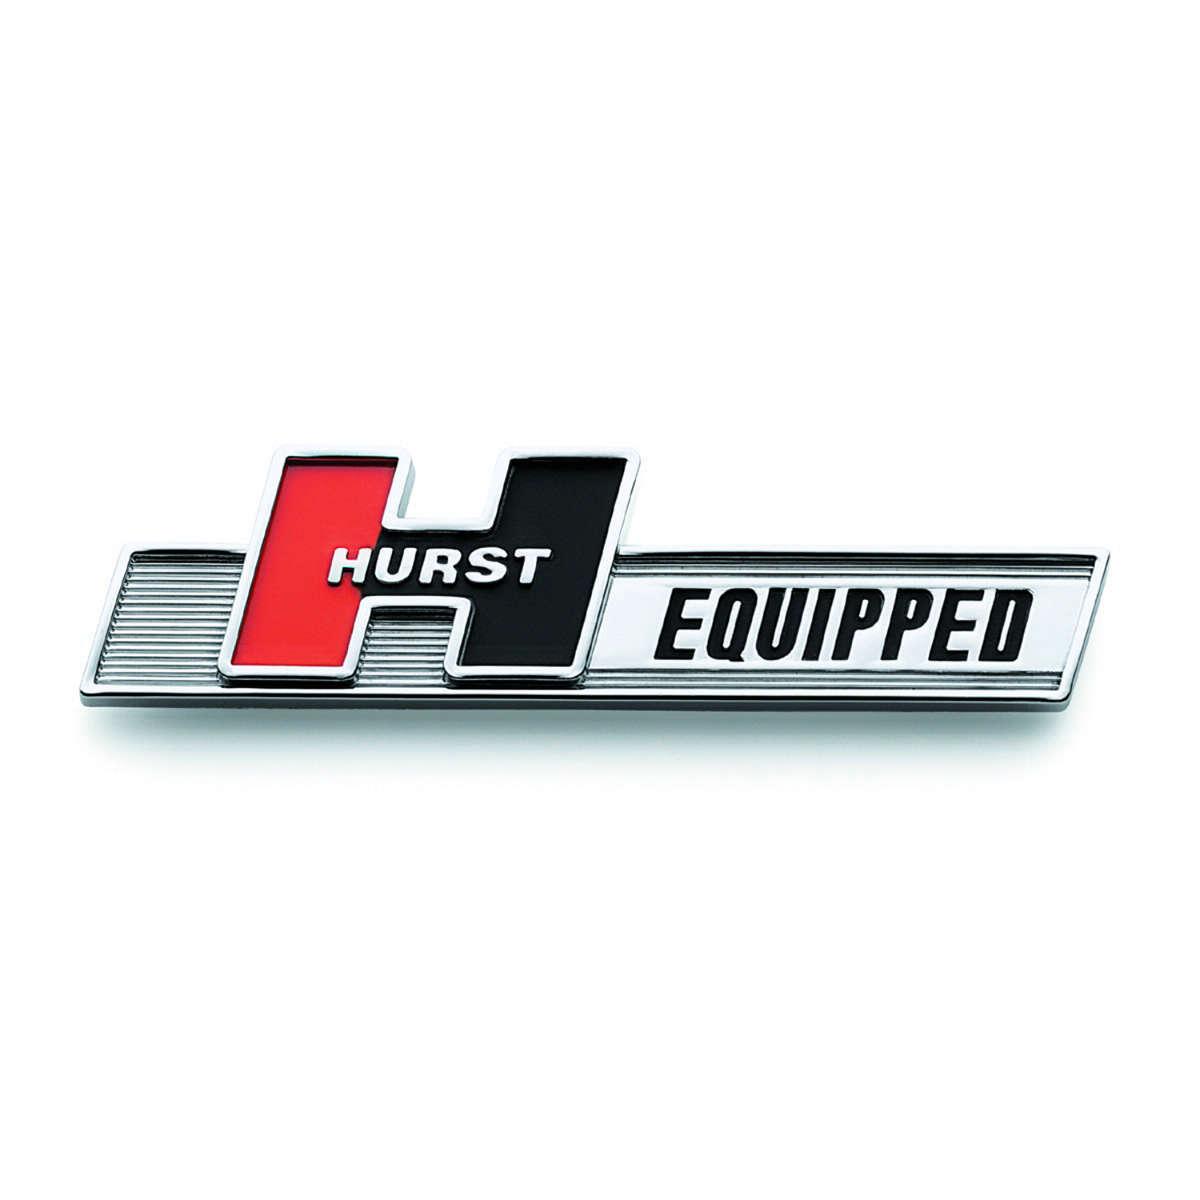 Hurst Equipped Emblem